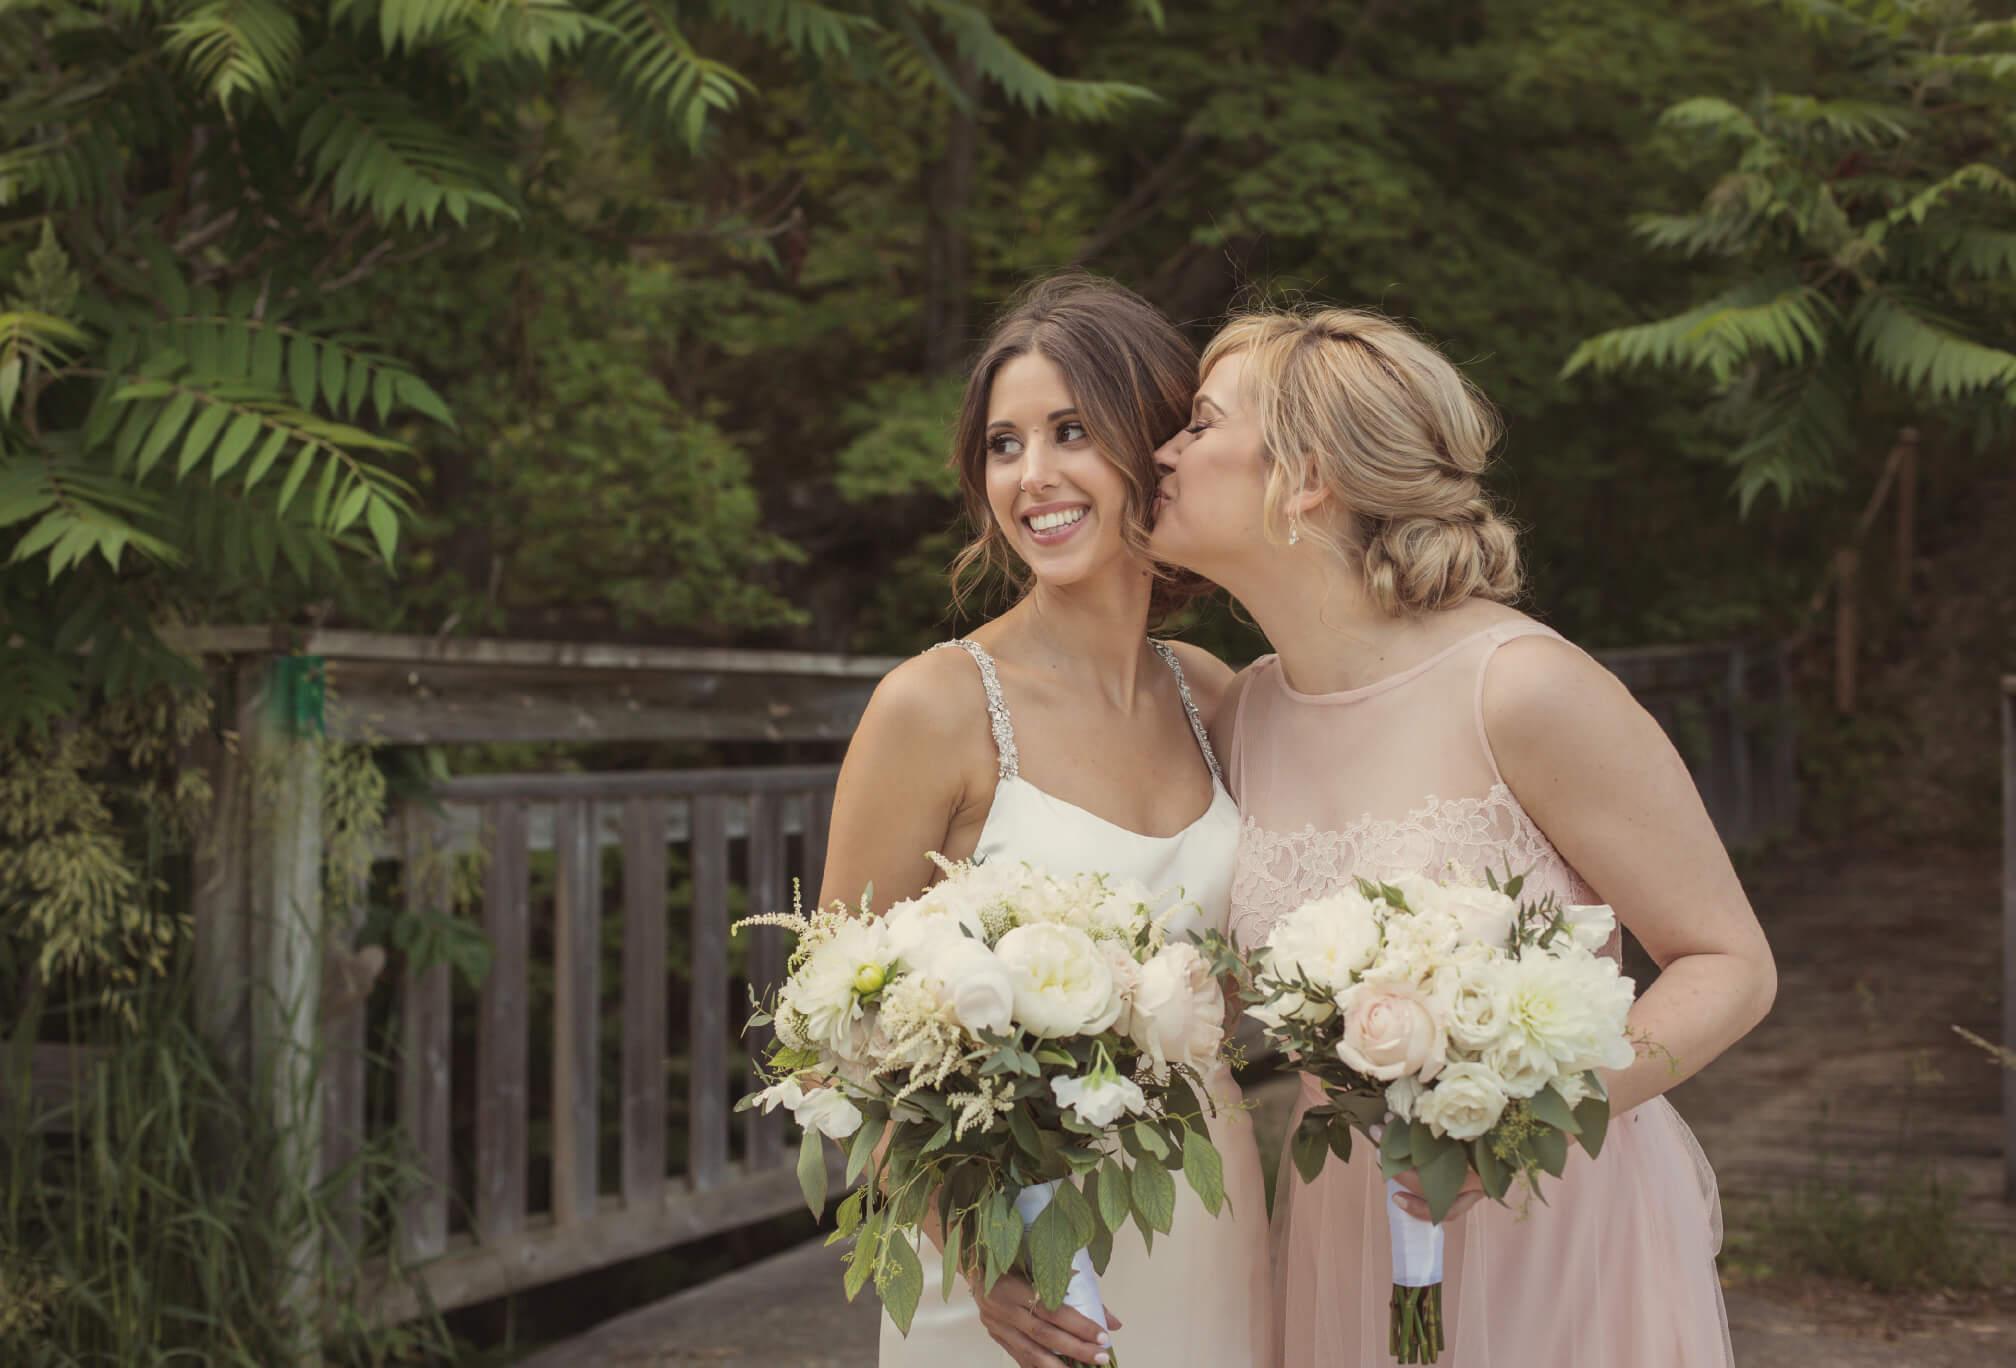 bridesmaids candid moments